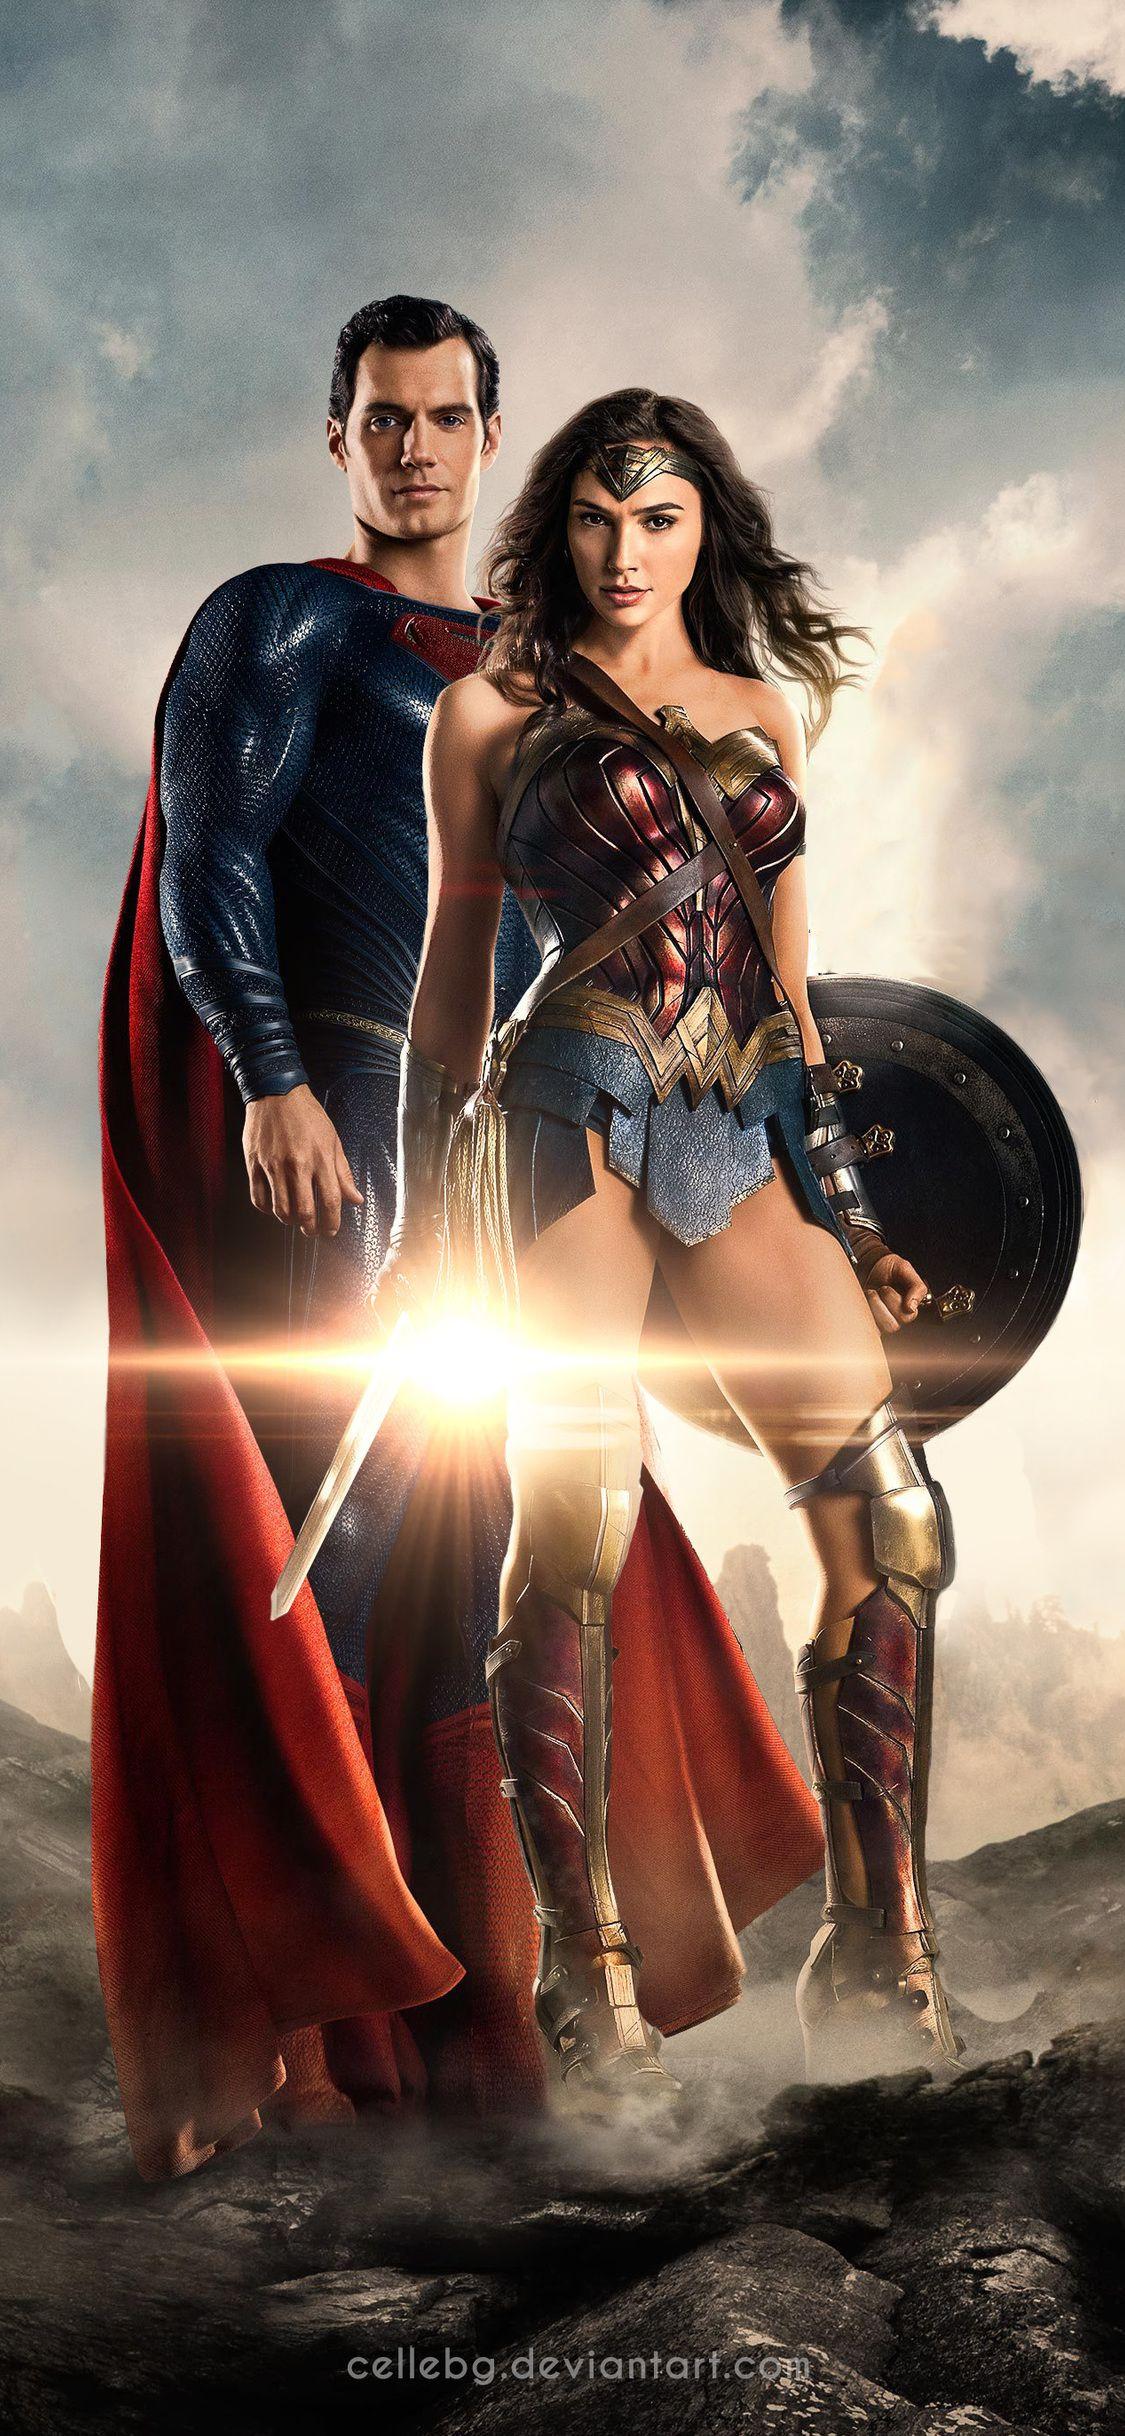 1125x2436 Justice League Superman Wonder Woman 4k Iphone XSIphone 1125x2436